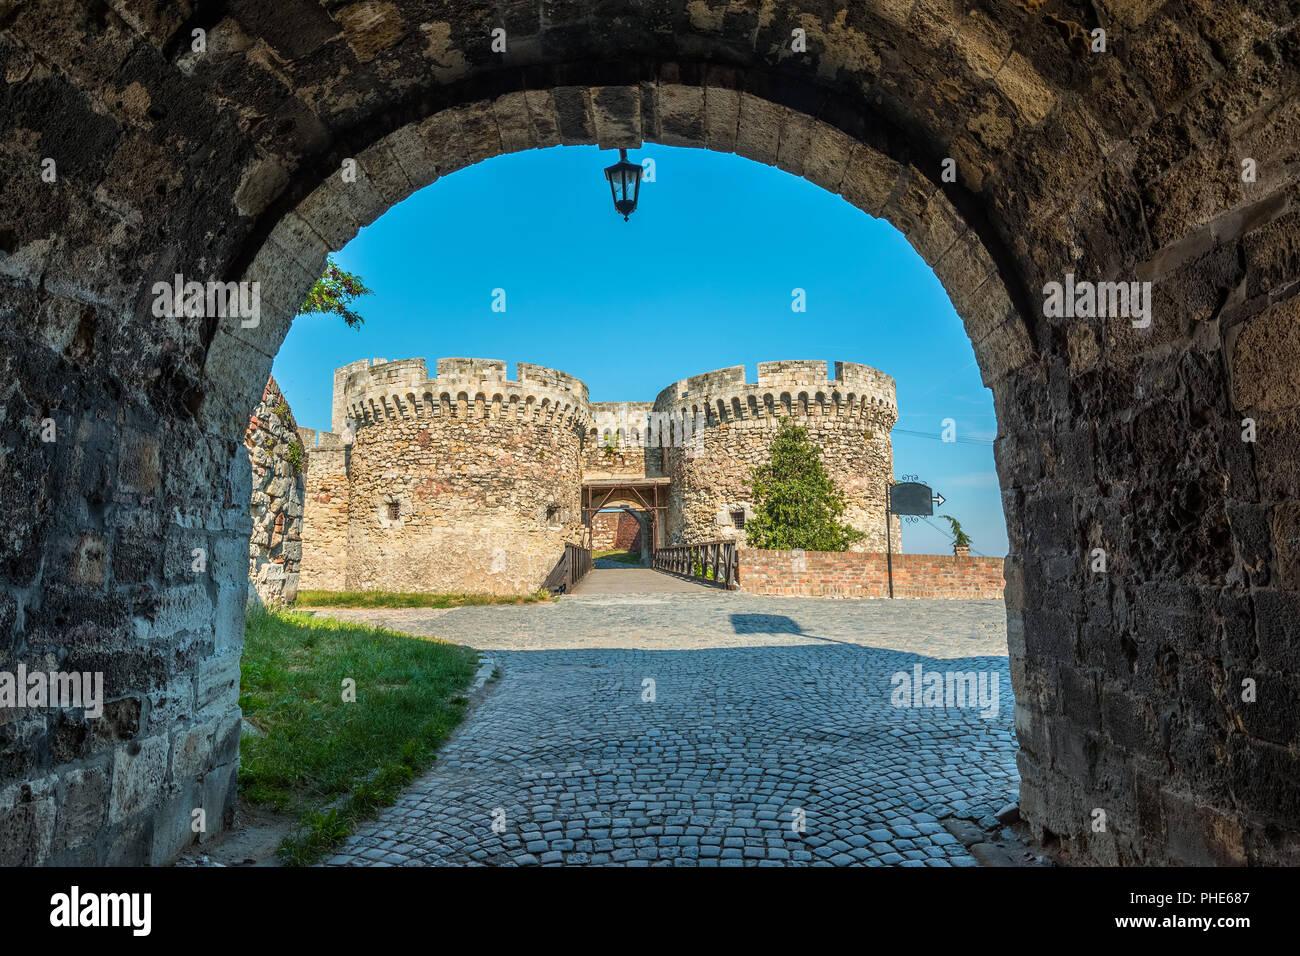 Kalemegdan fortress in Belgrade, Serbia - Stock Image